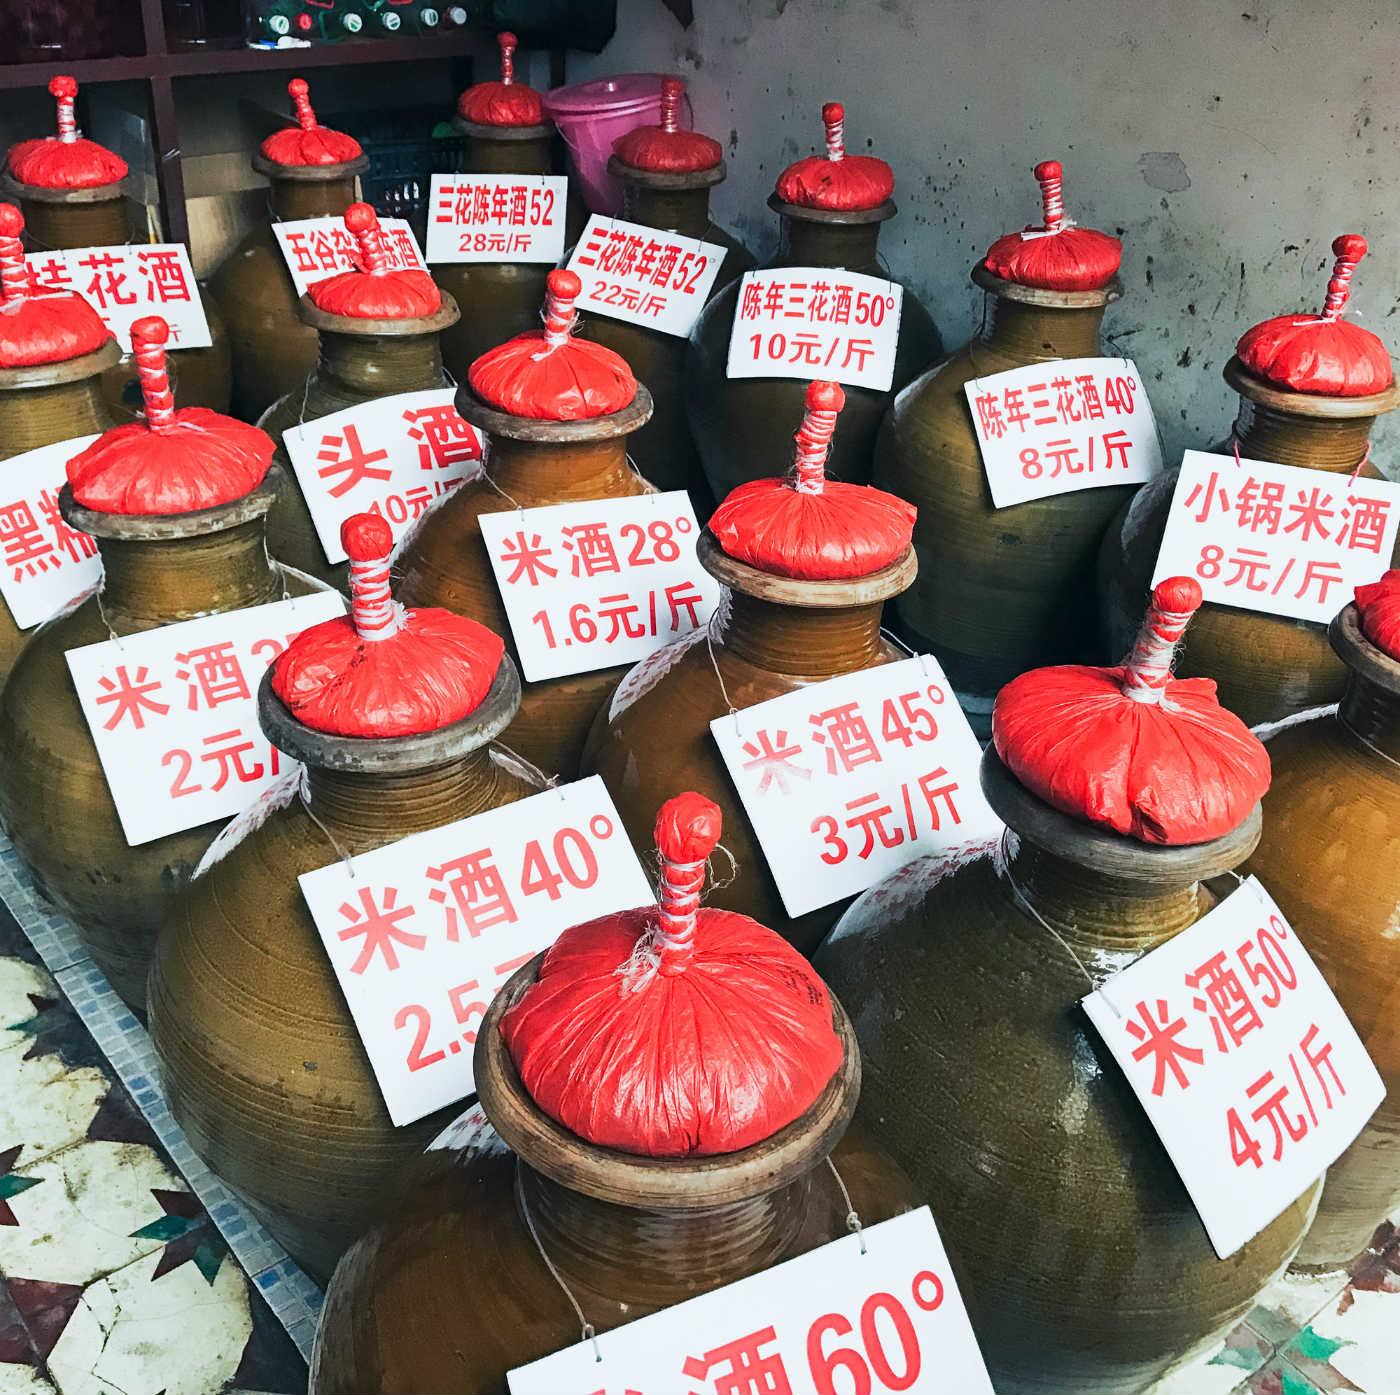 Fake baijiuliquor China